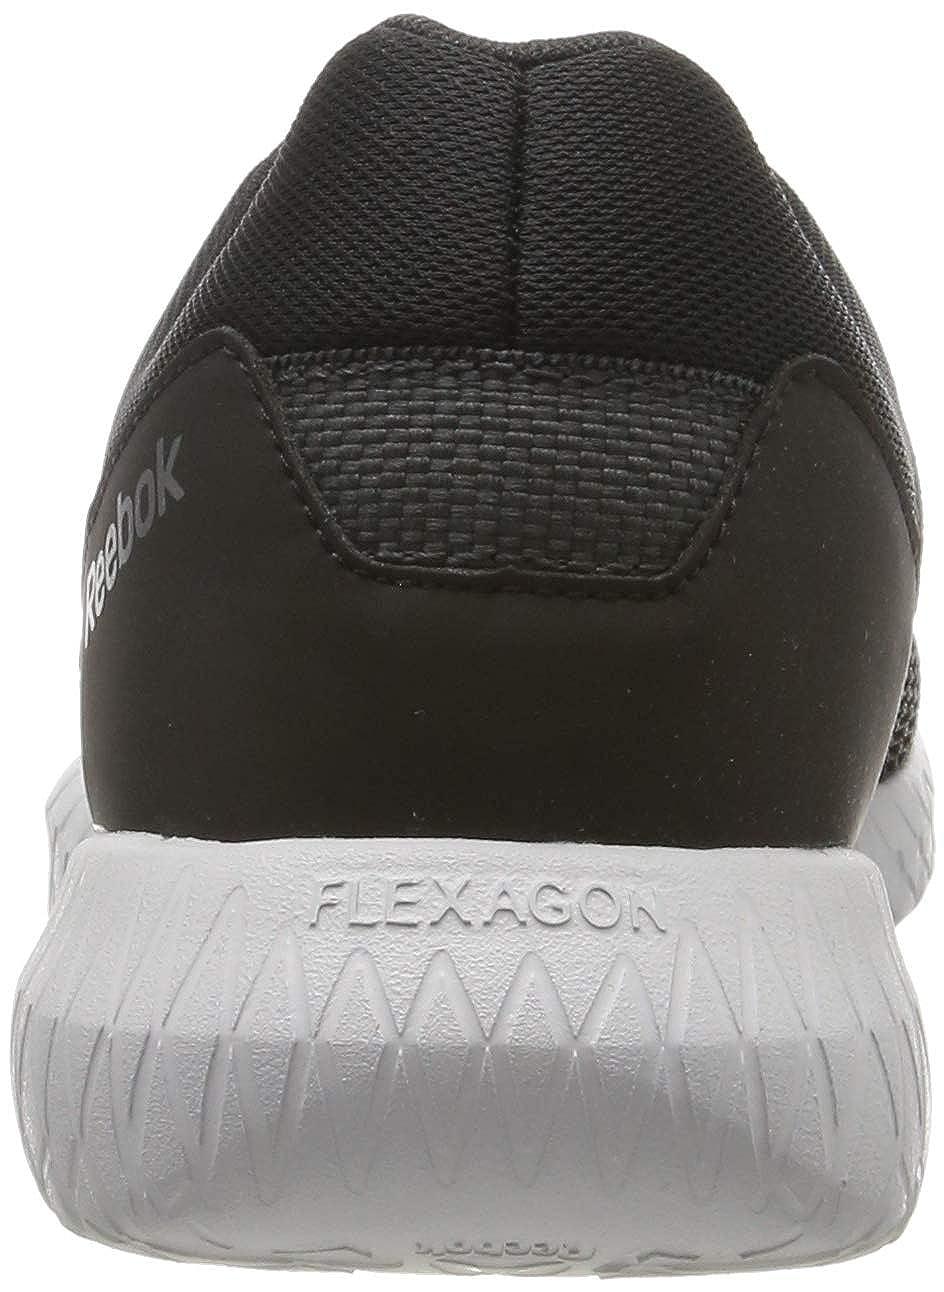 Scarpe da Fitness Uomo Reebok Flexagon Energy Mt